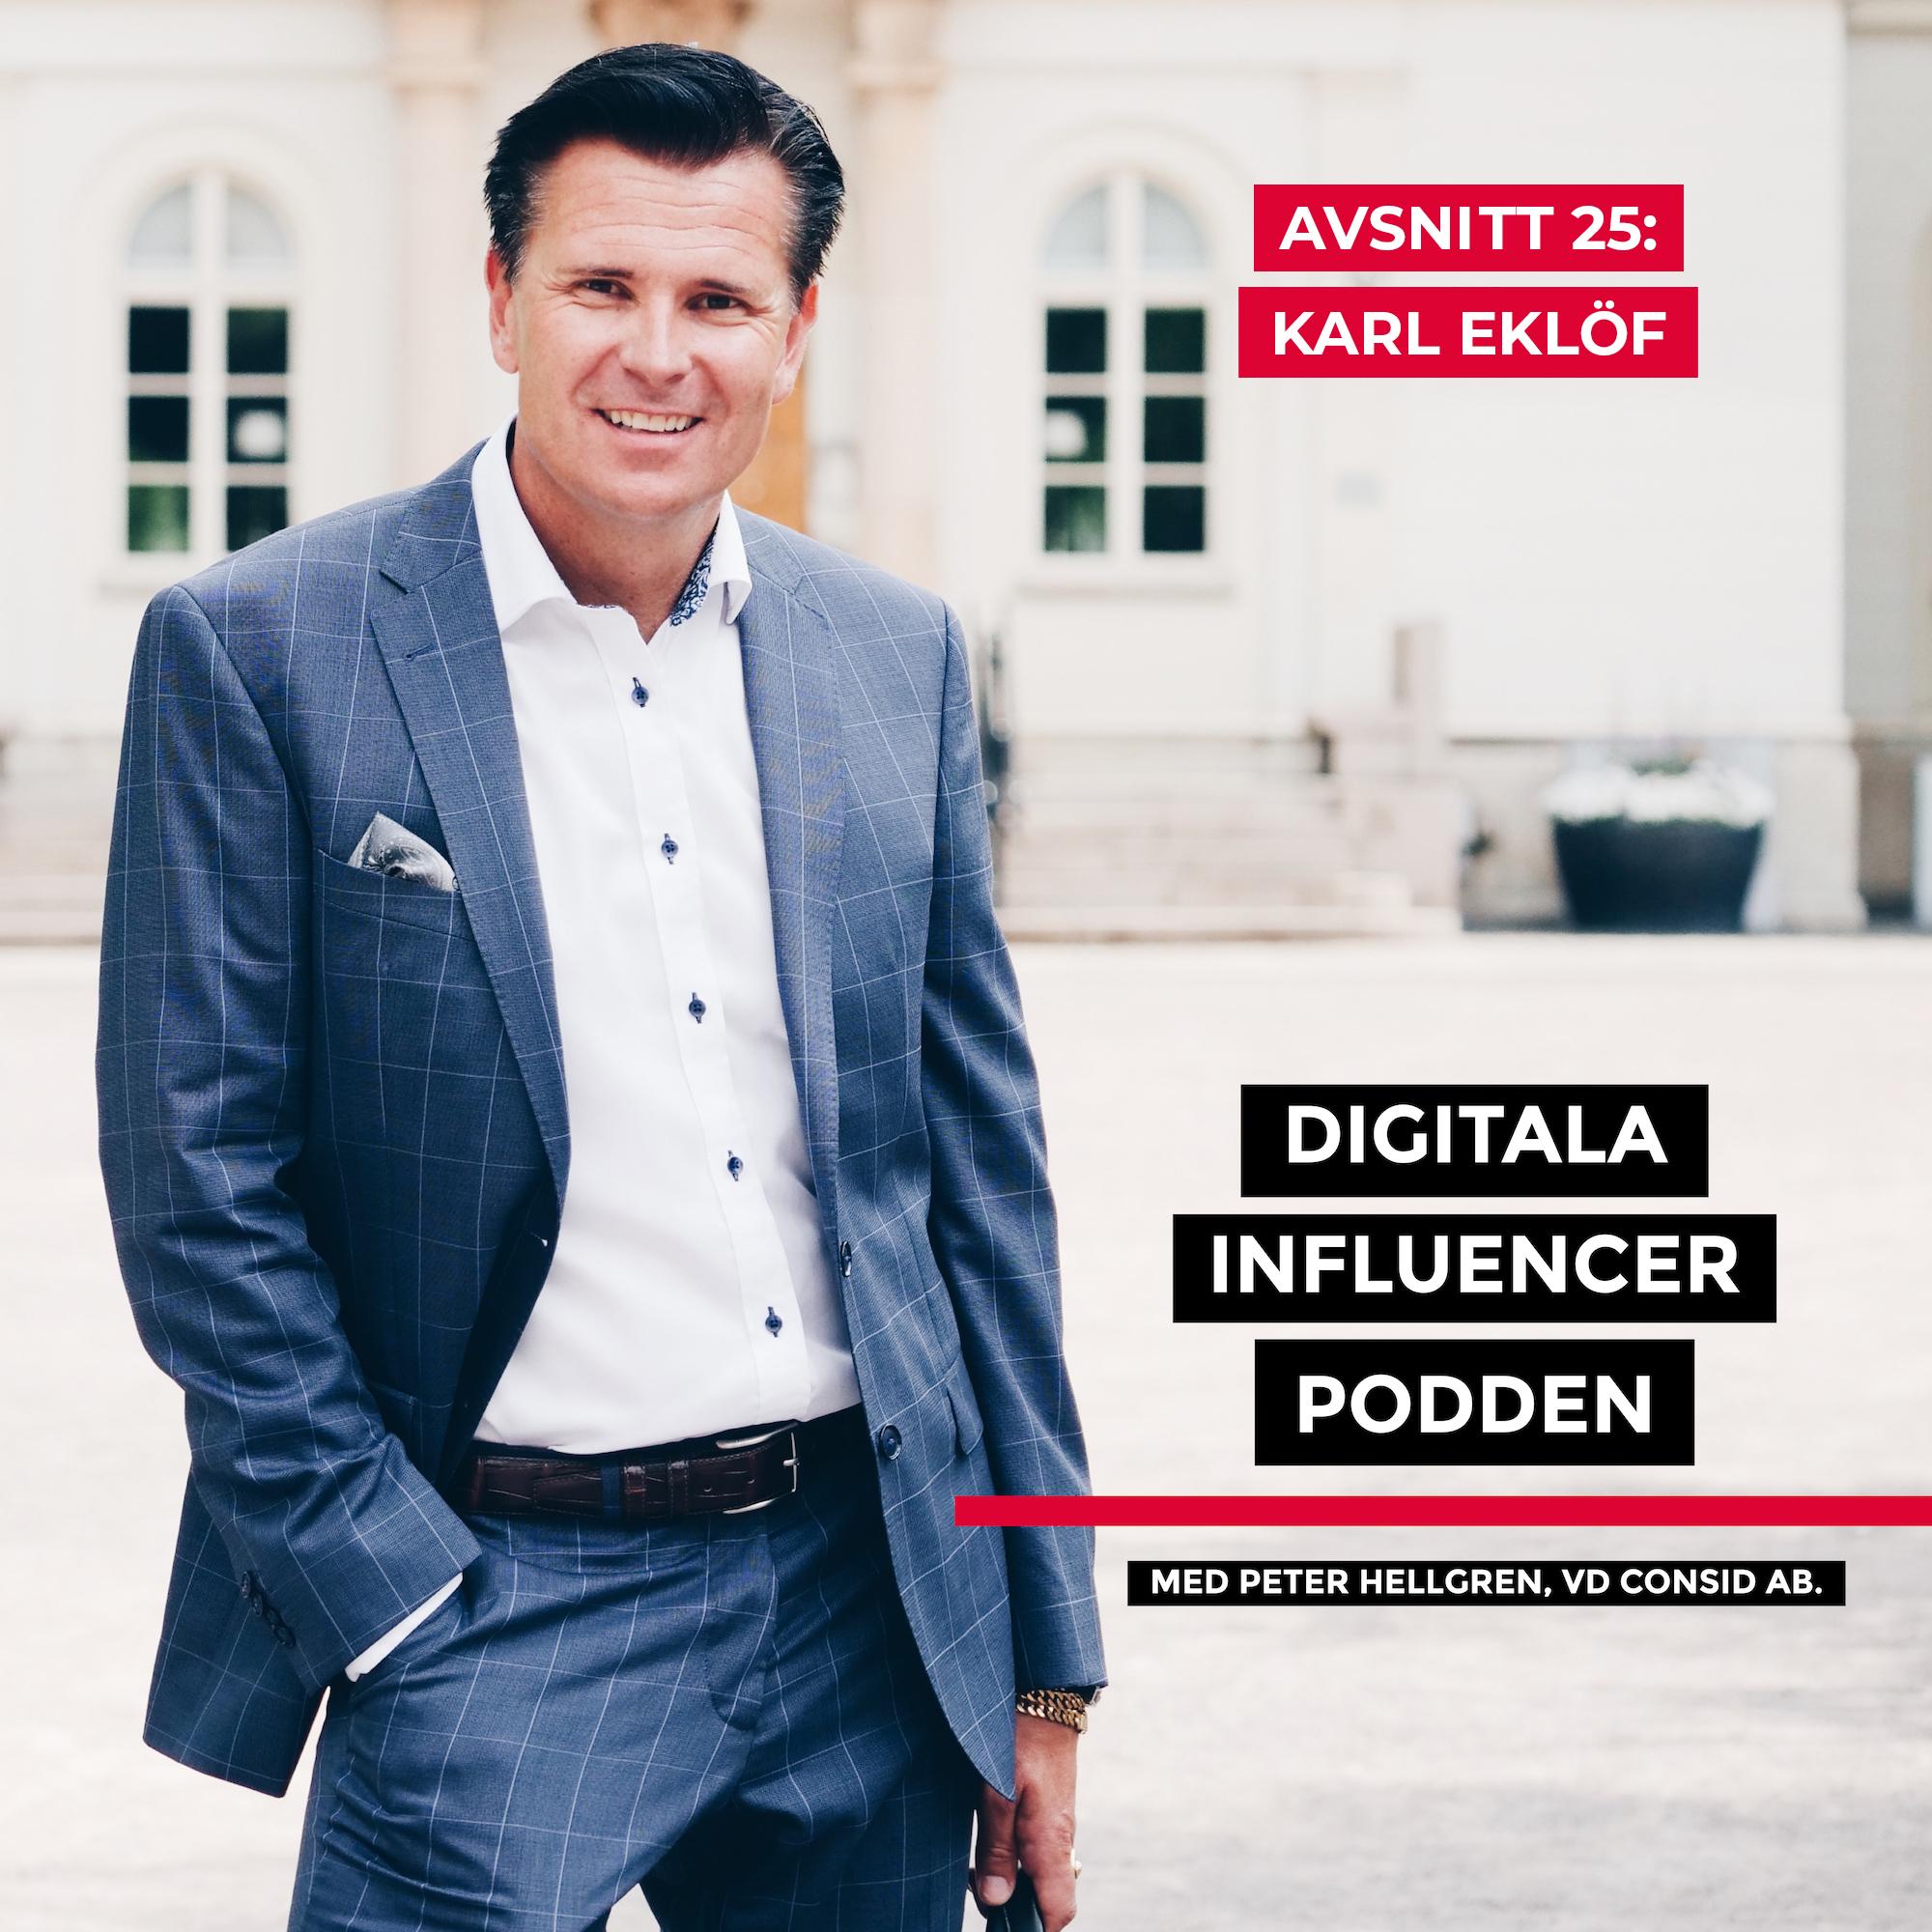 25. Karl Eklöf, SiteVision